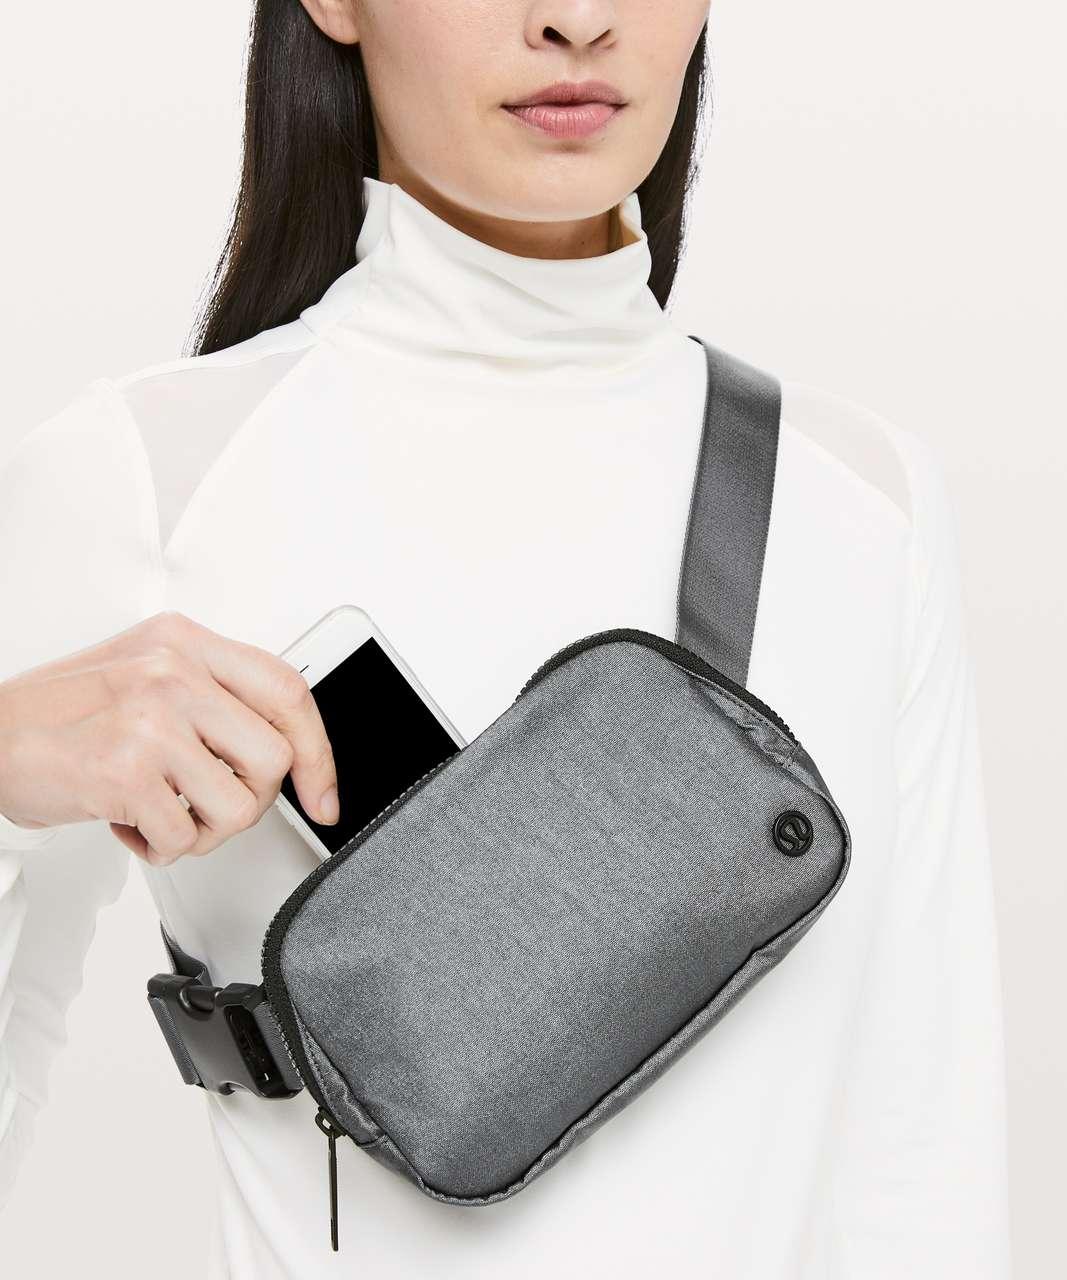 Lululemon Everywhere Belt Bag *1L - TB2 Shiny Black